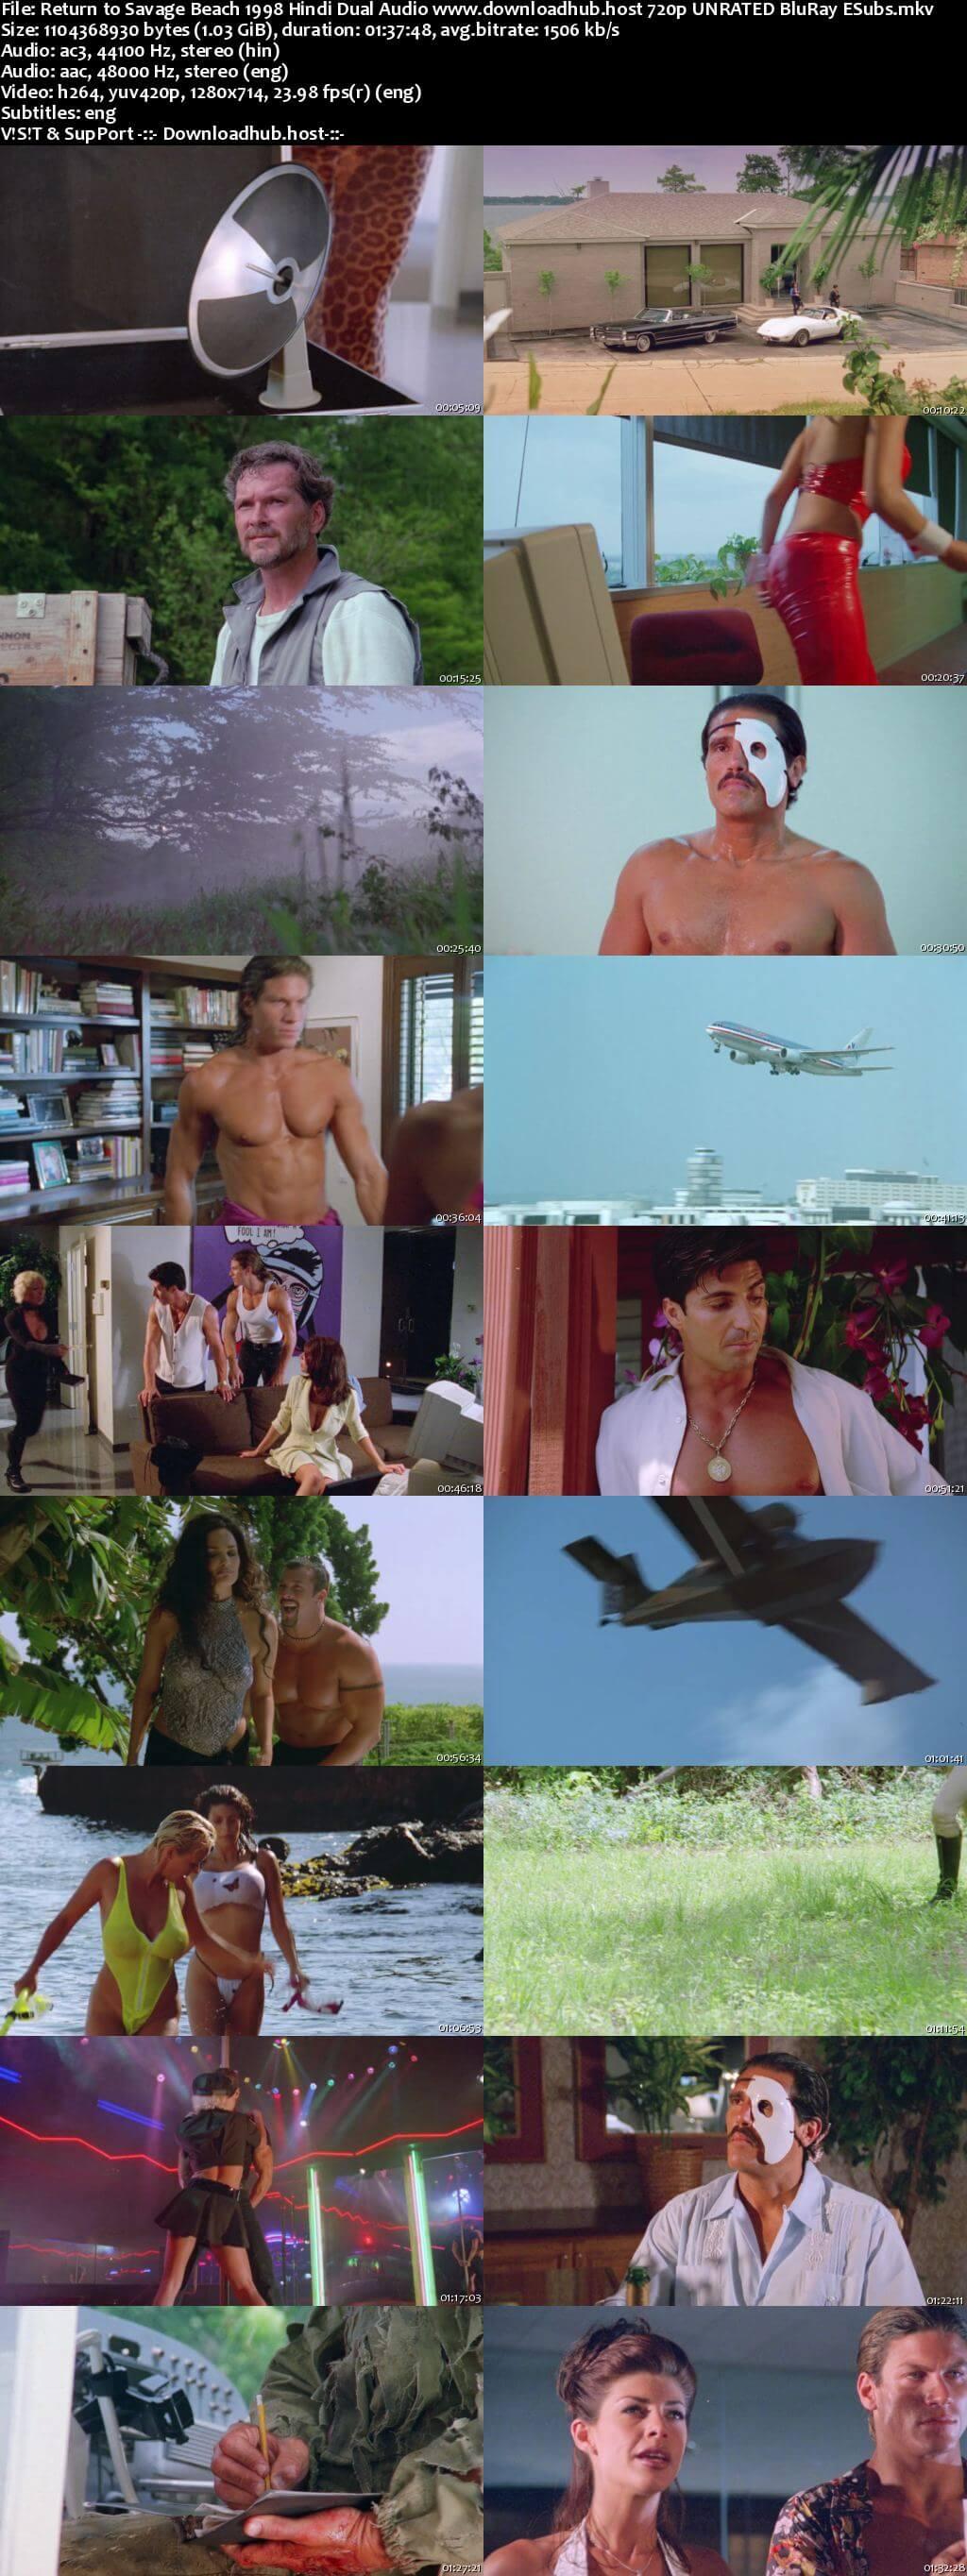 Return to Savage Beach 1998 Hindi Dual Audio 720p UNRATED BluRay ESubs